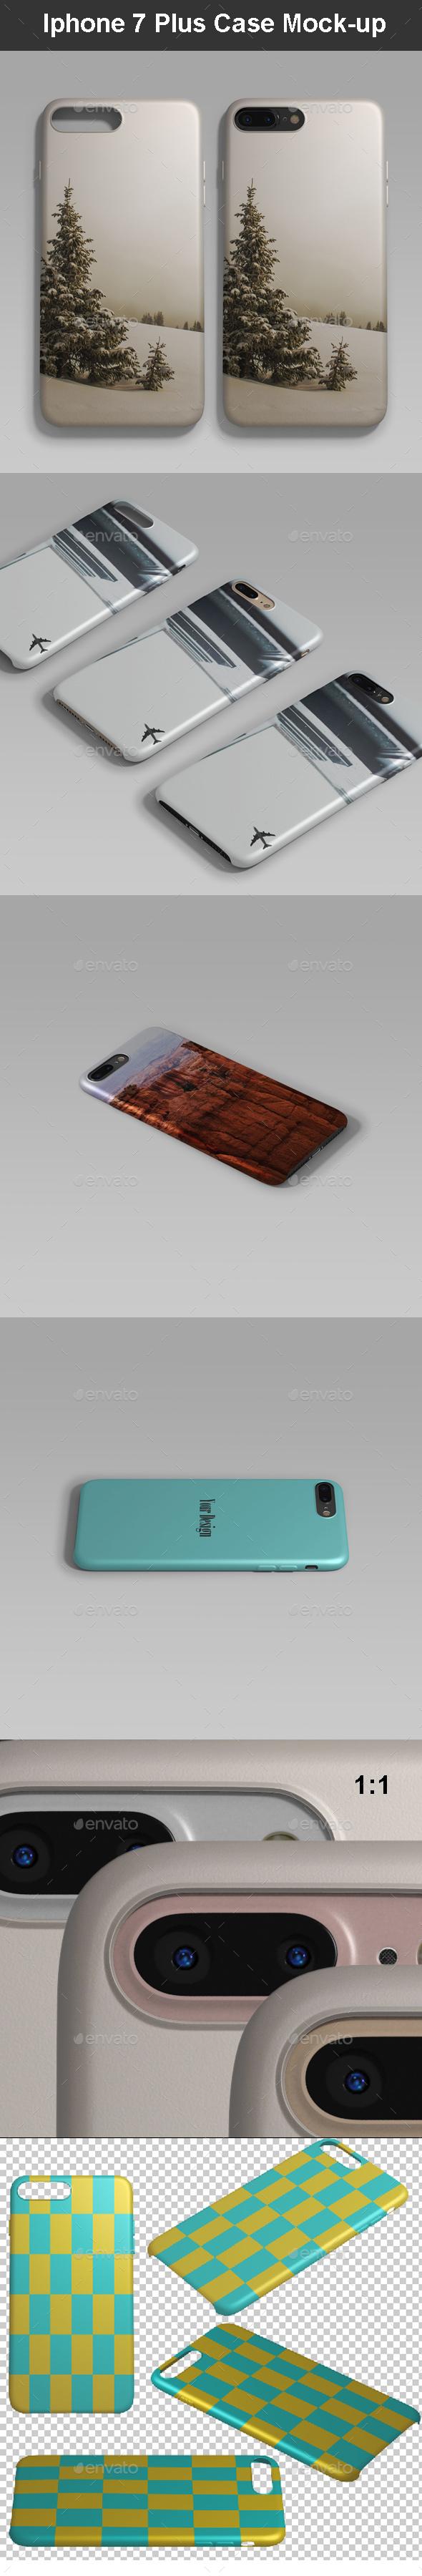 Phone 7 Plus Case Mock-up - Mobile Displays